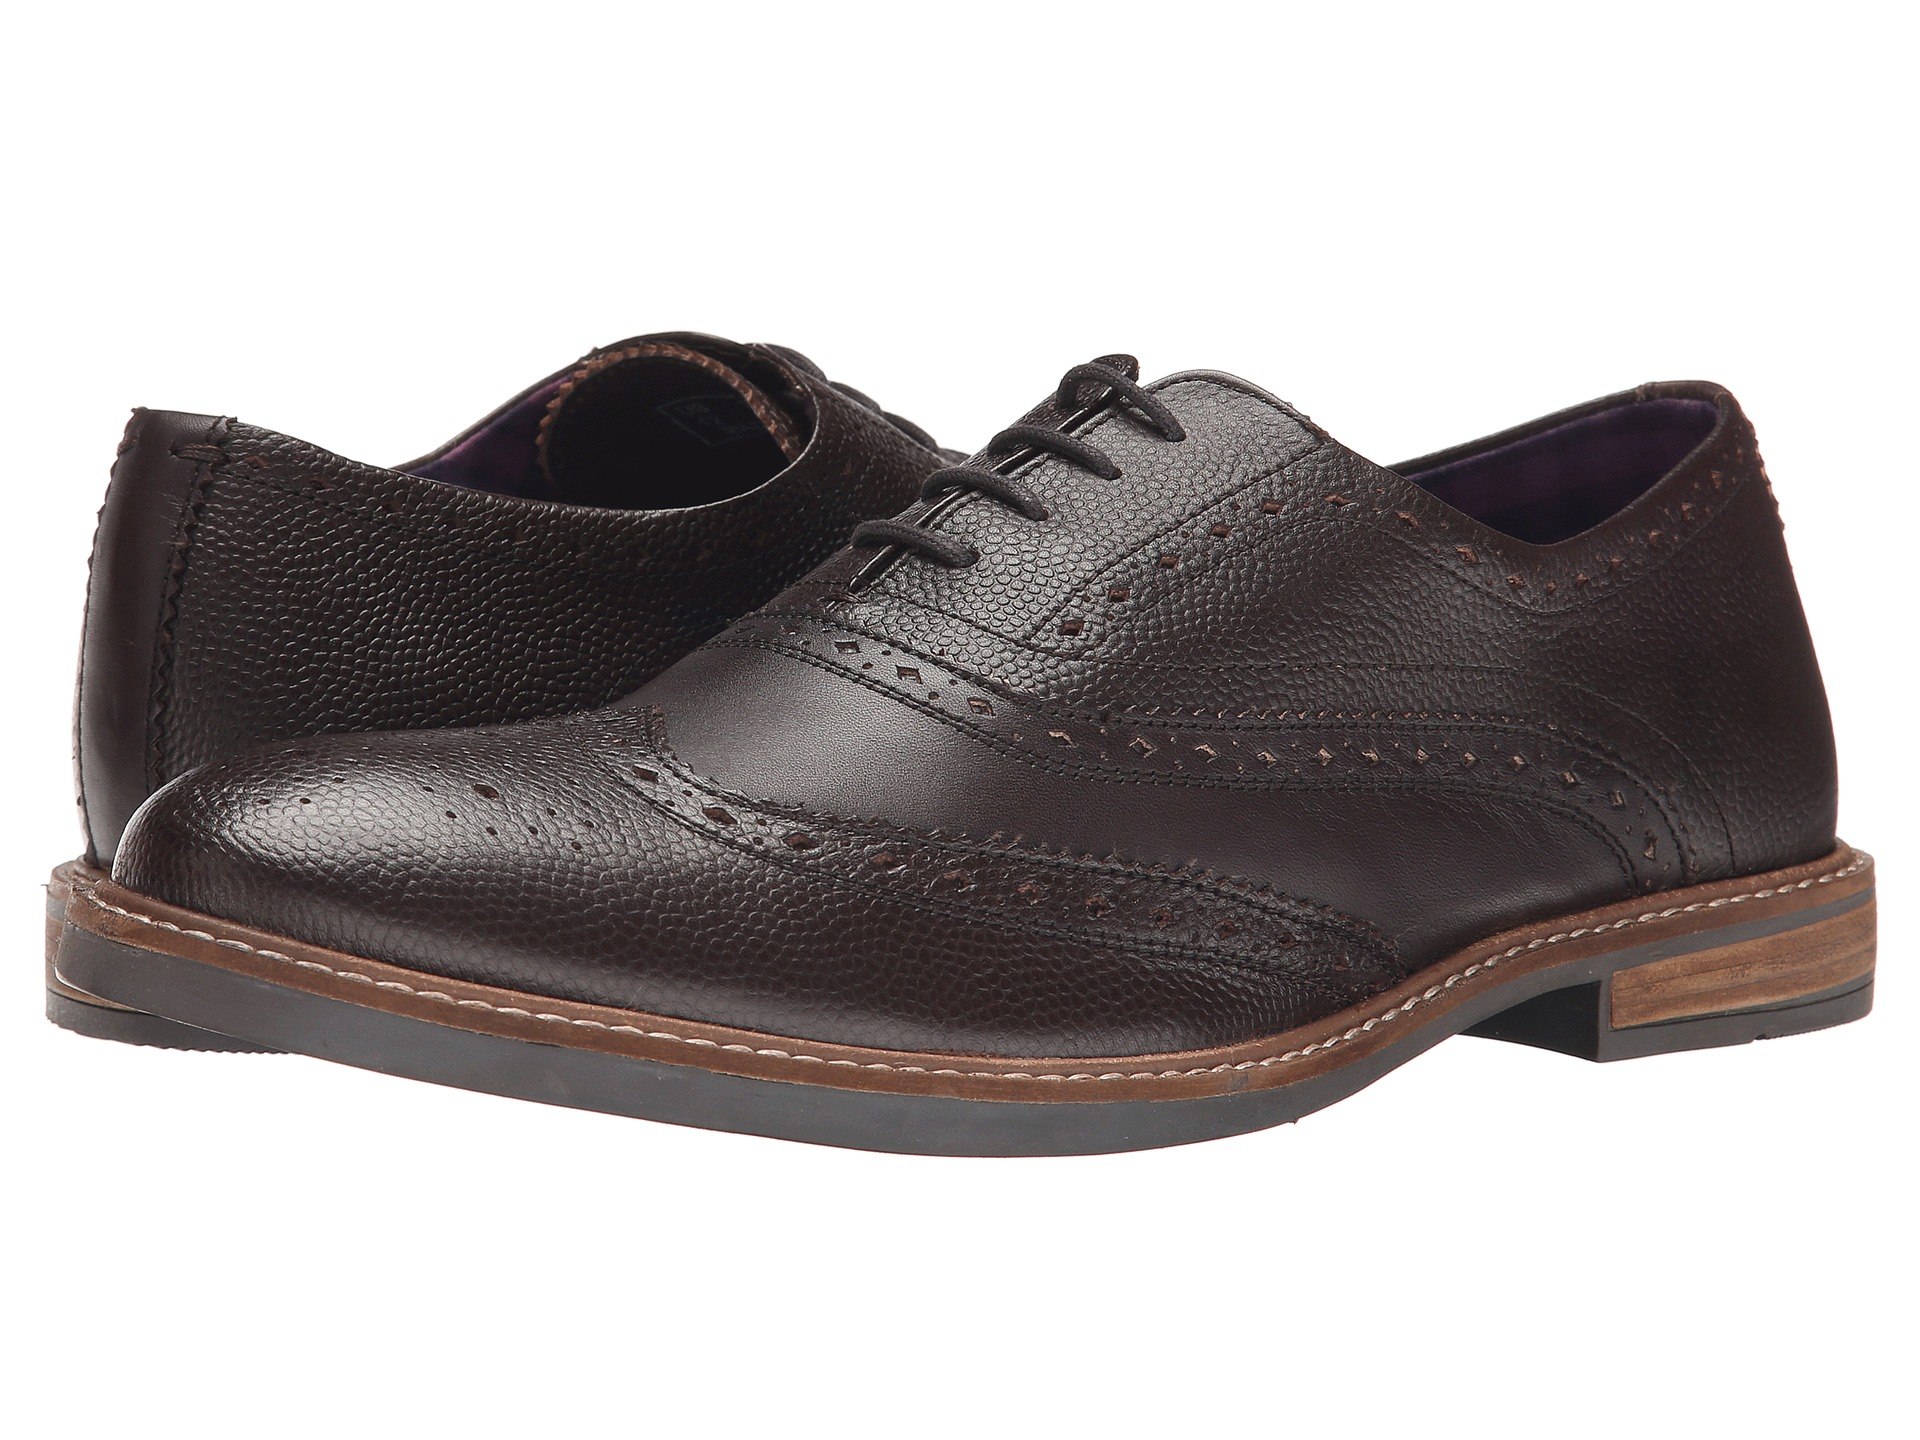 Ben Sherman Men Shoe Review